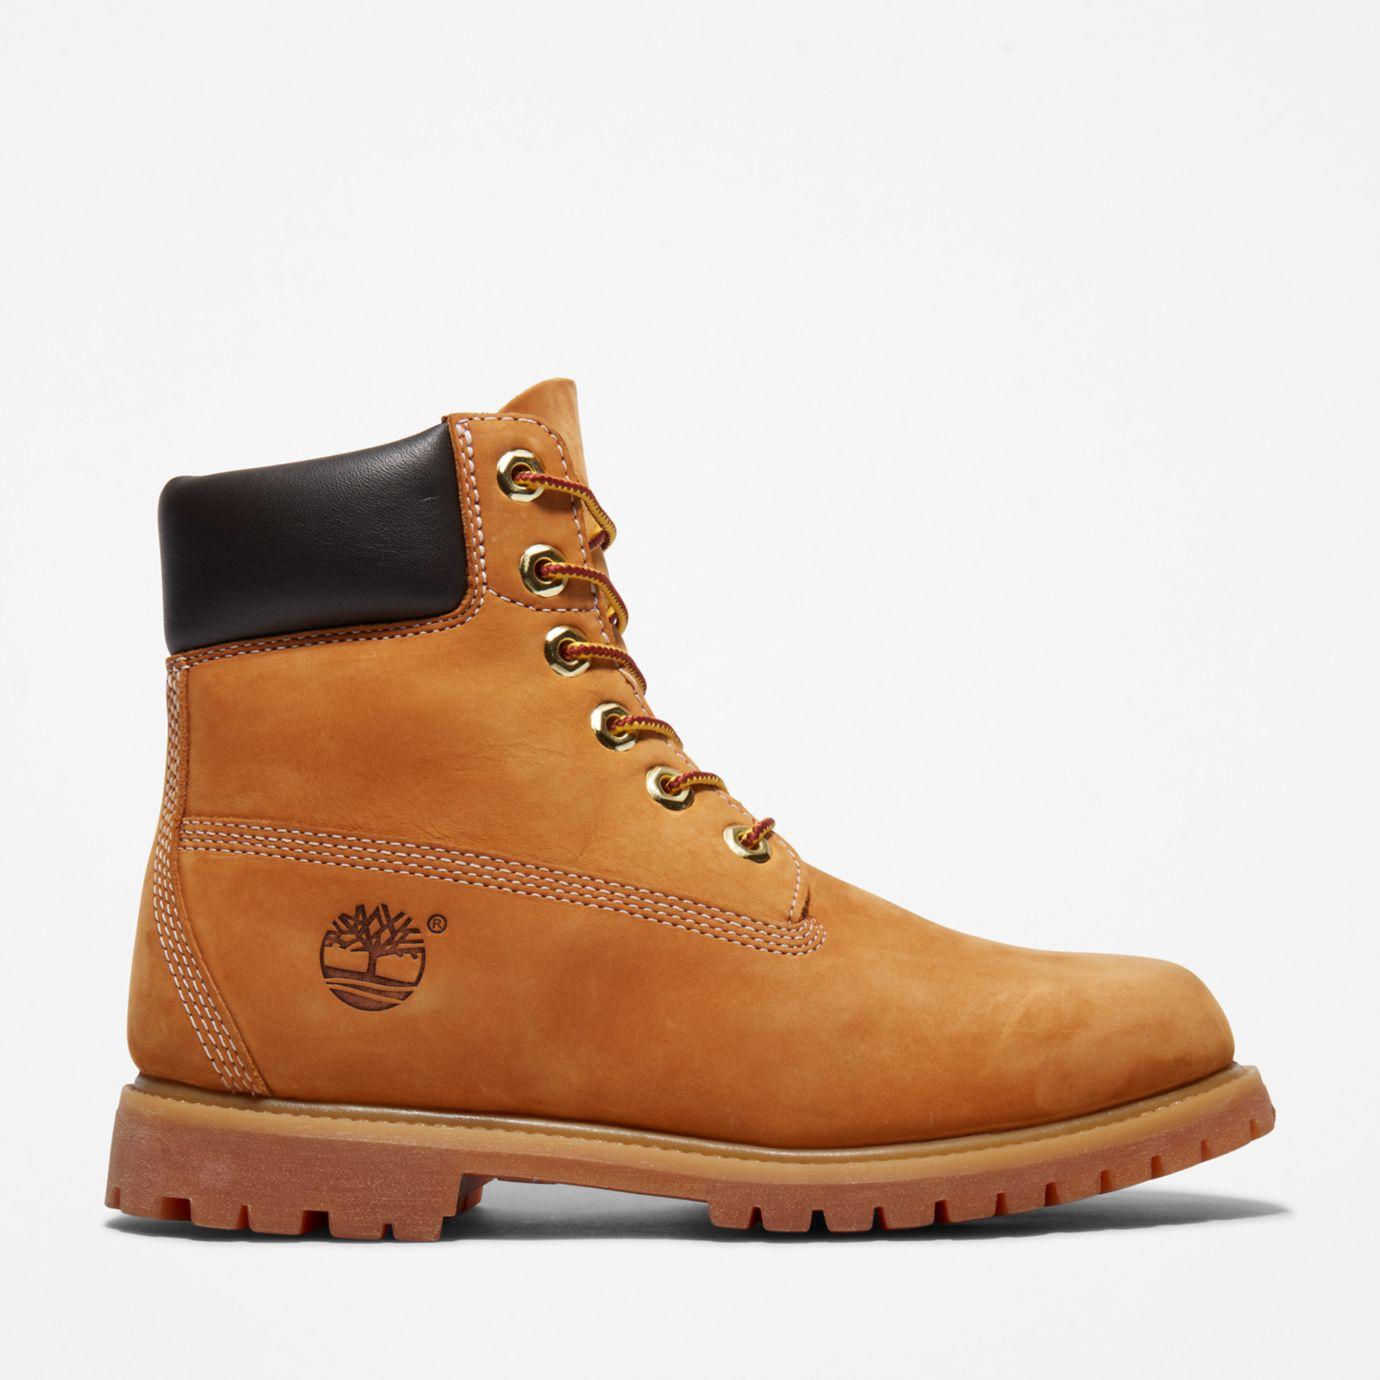 4b9ddbd5b4 The Original Yellow Boot: Timberland's history of the yellow boot